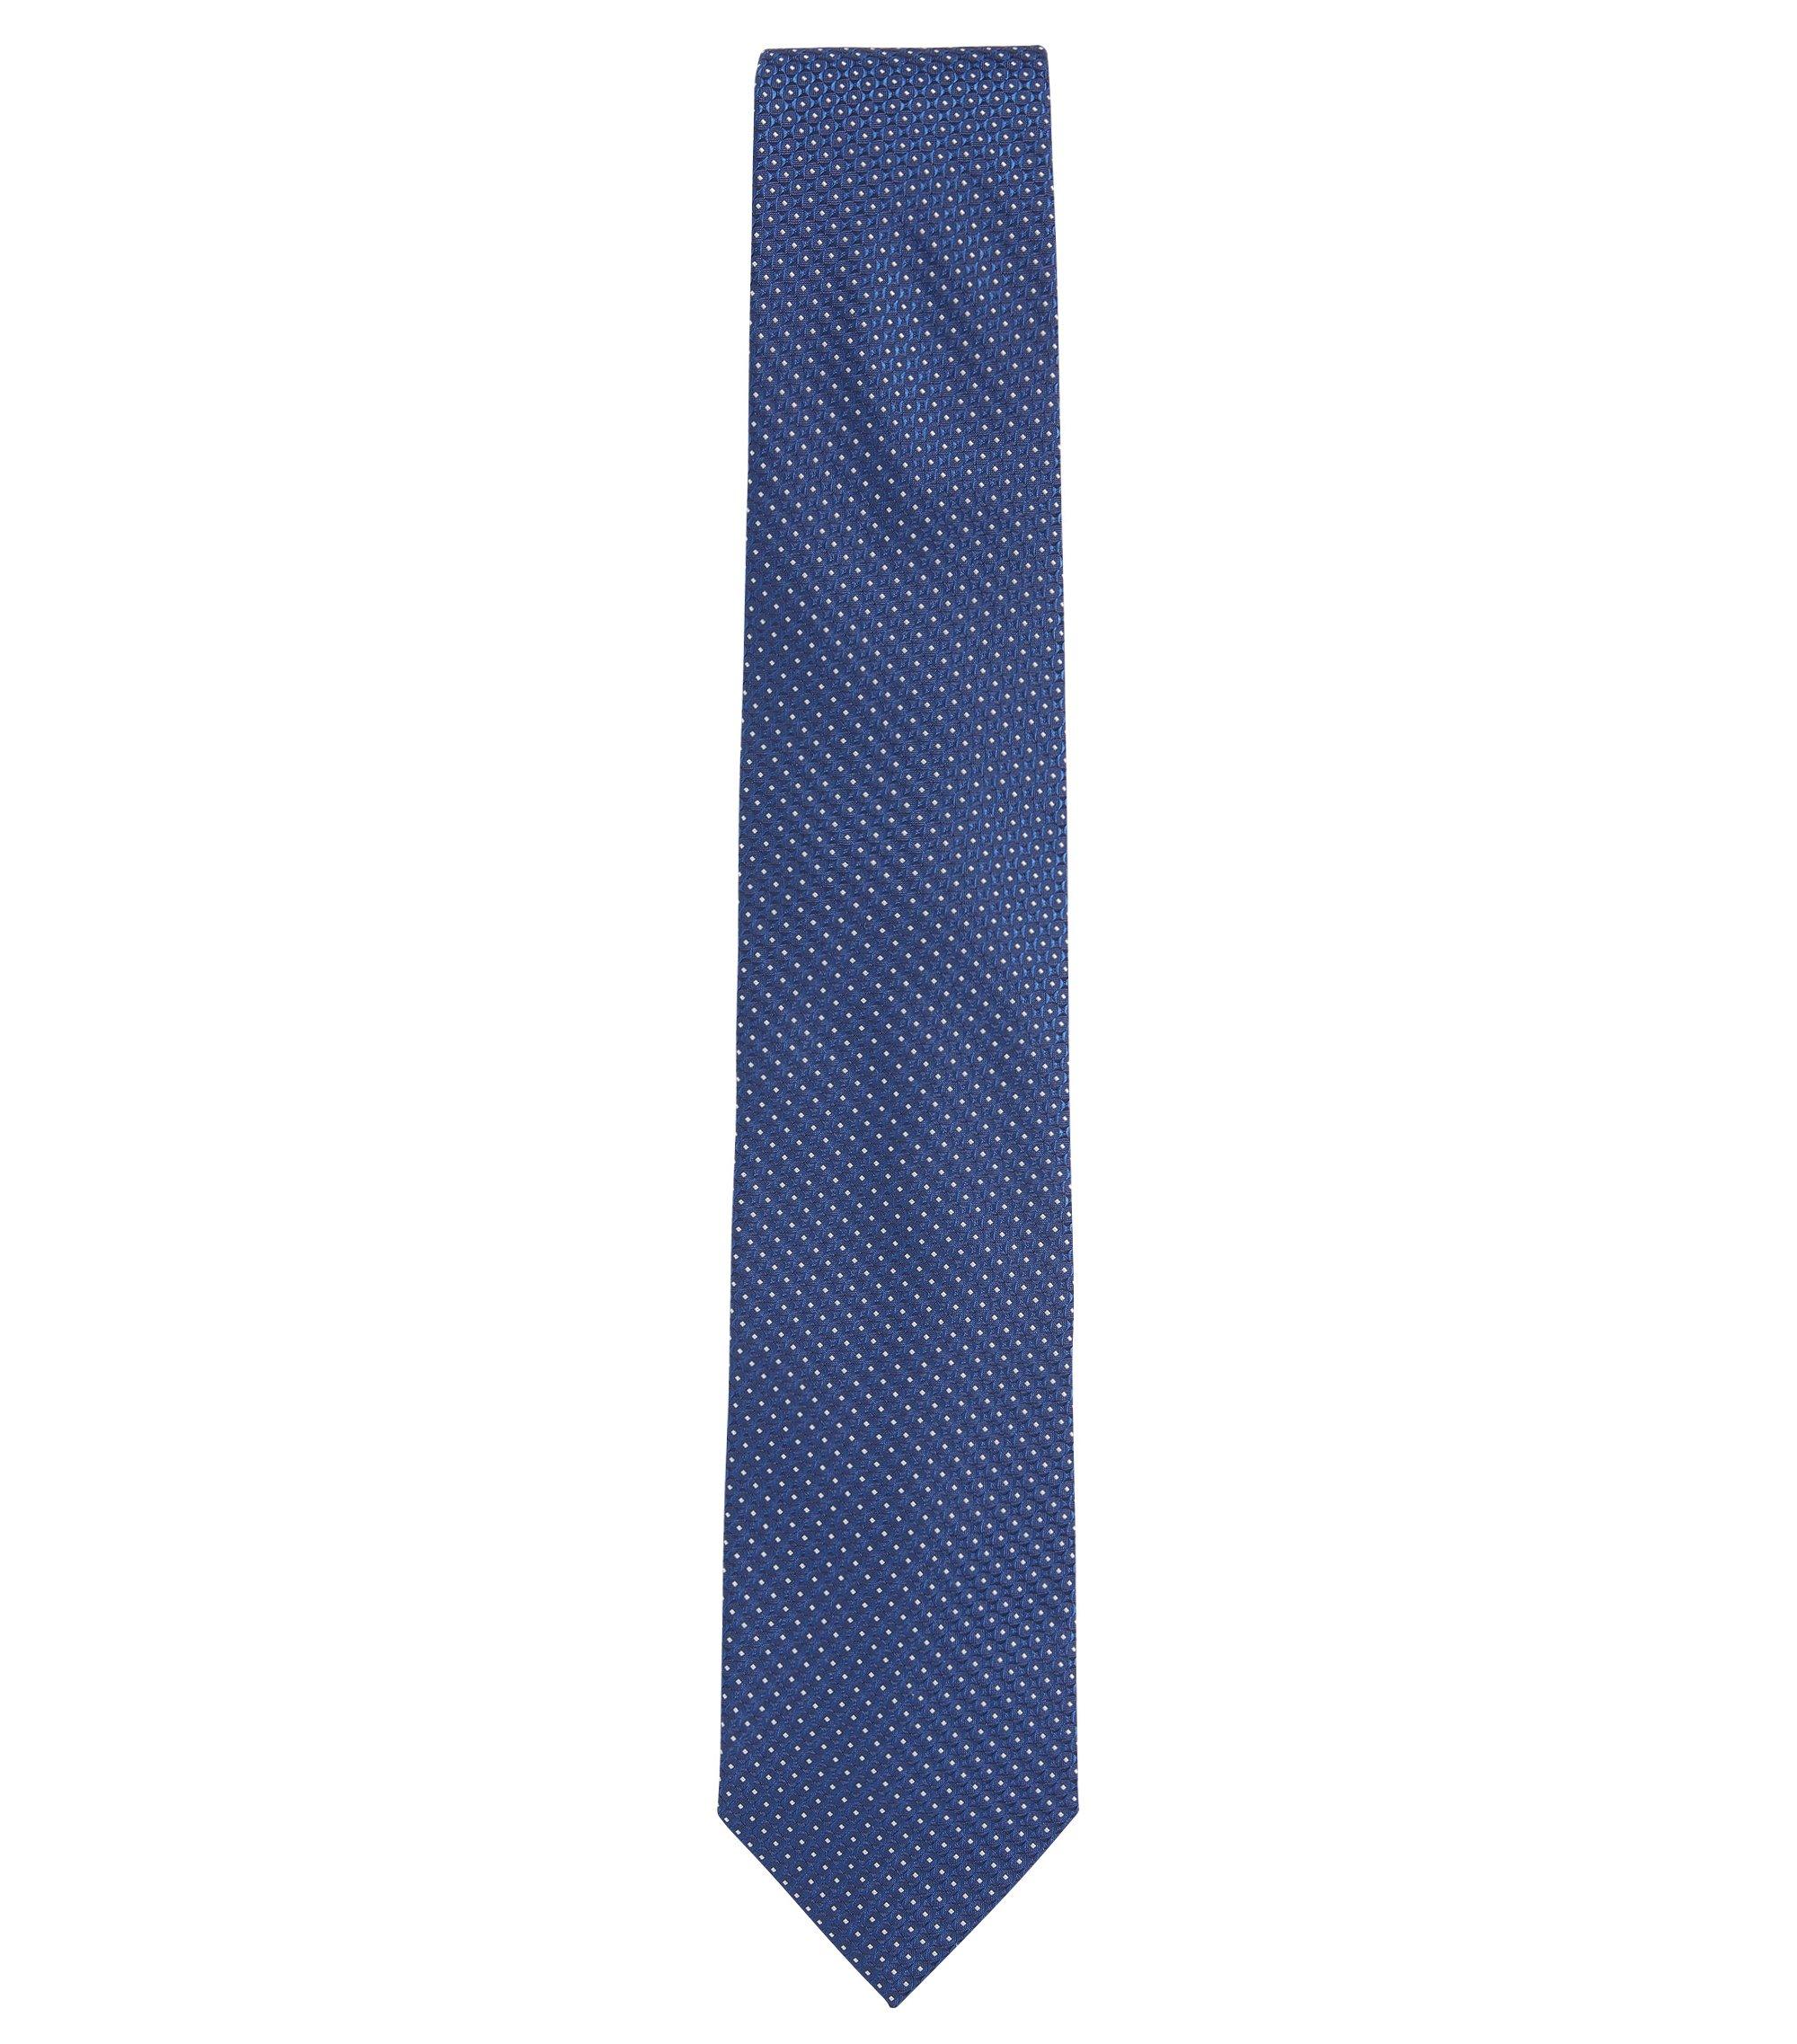 Patterned silk jacquard tie made in Italy, Dark Blue